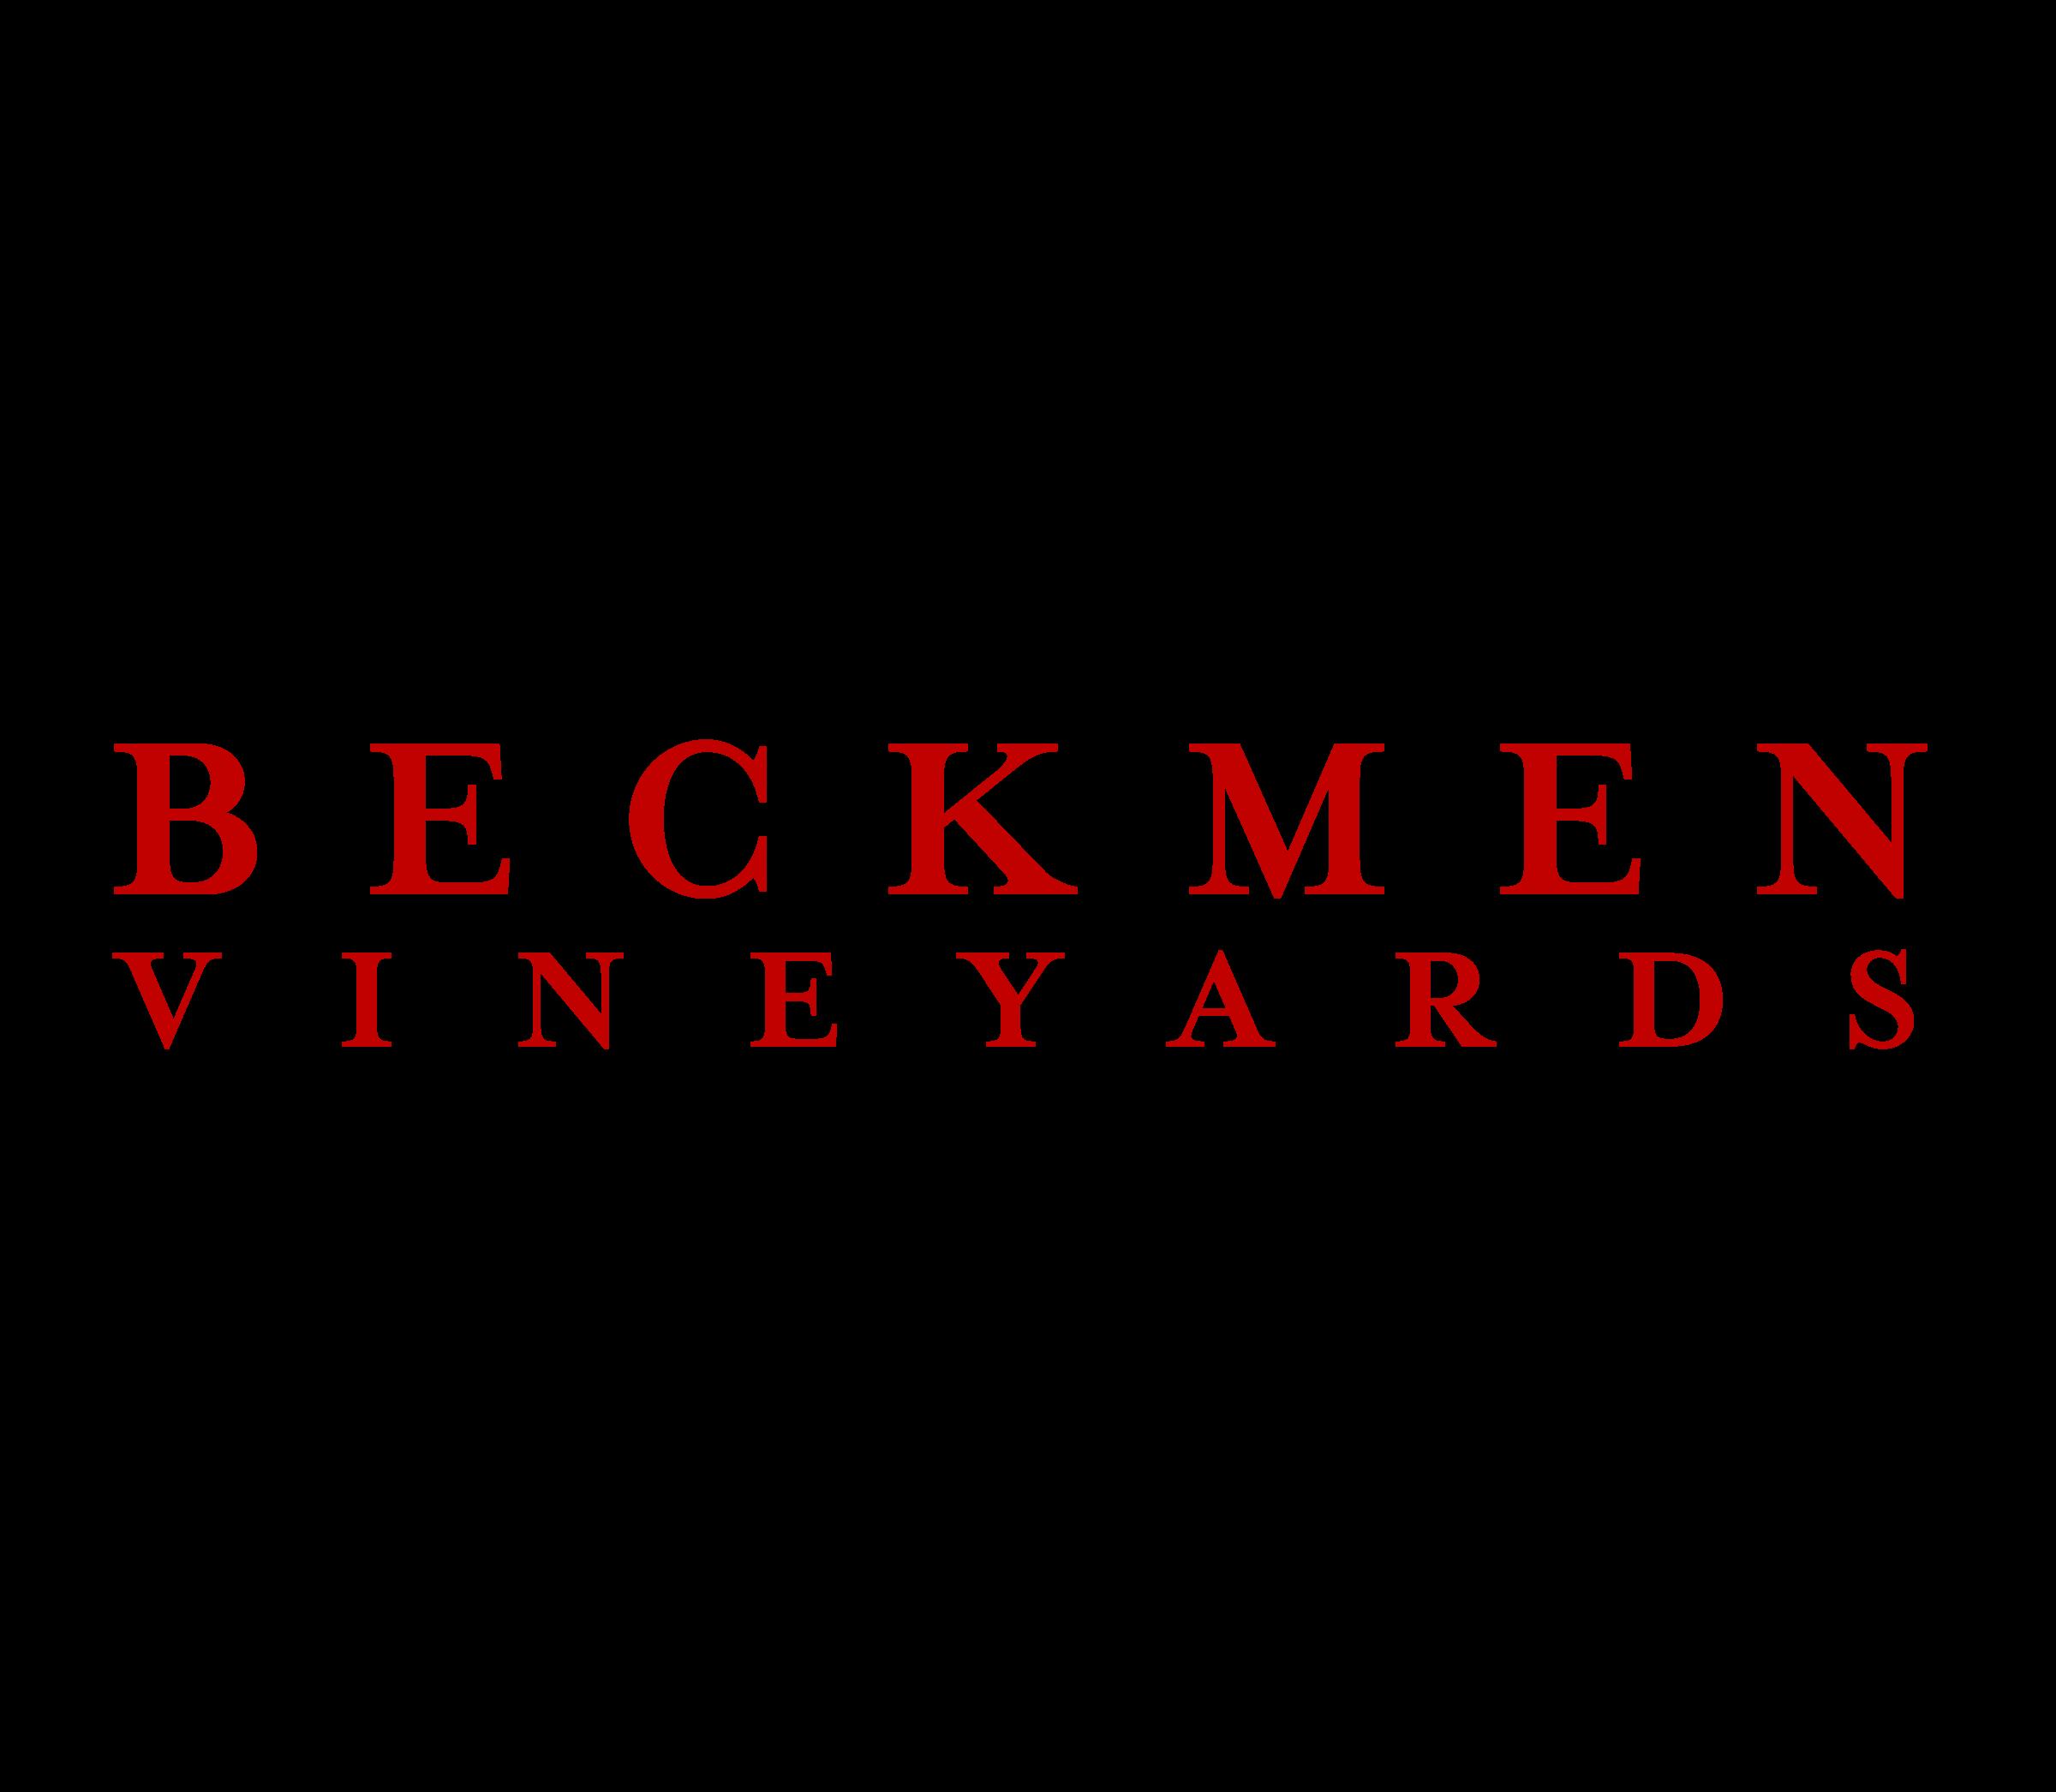 Download Beckmen Vineyards Text